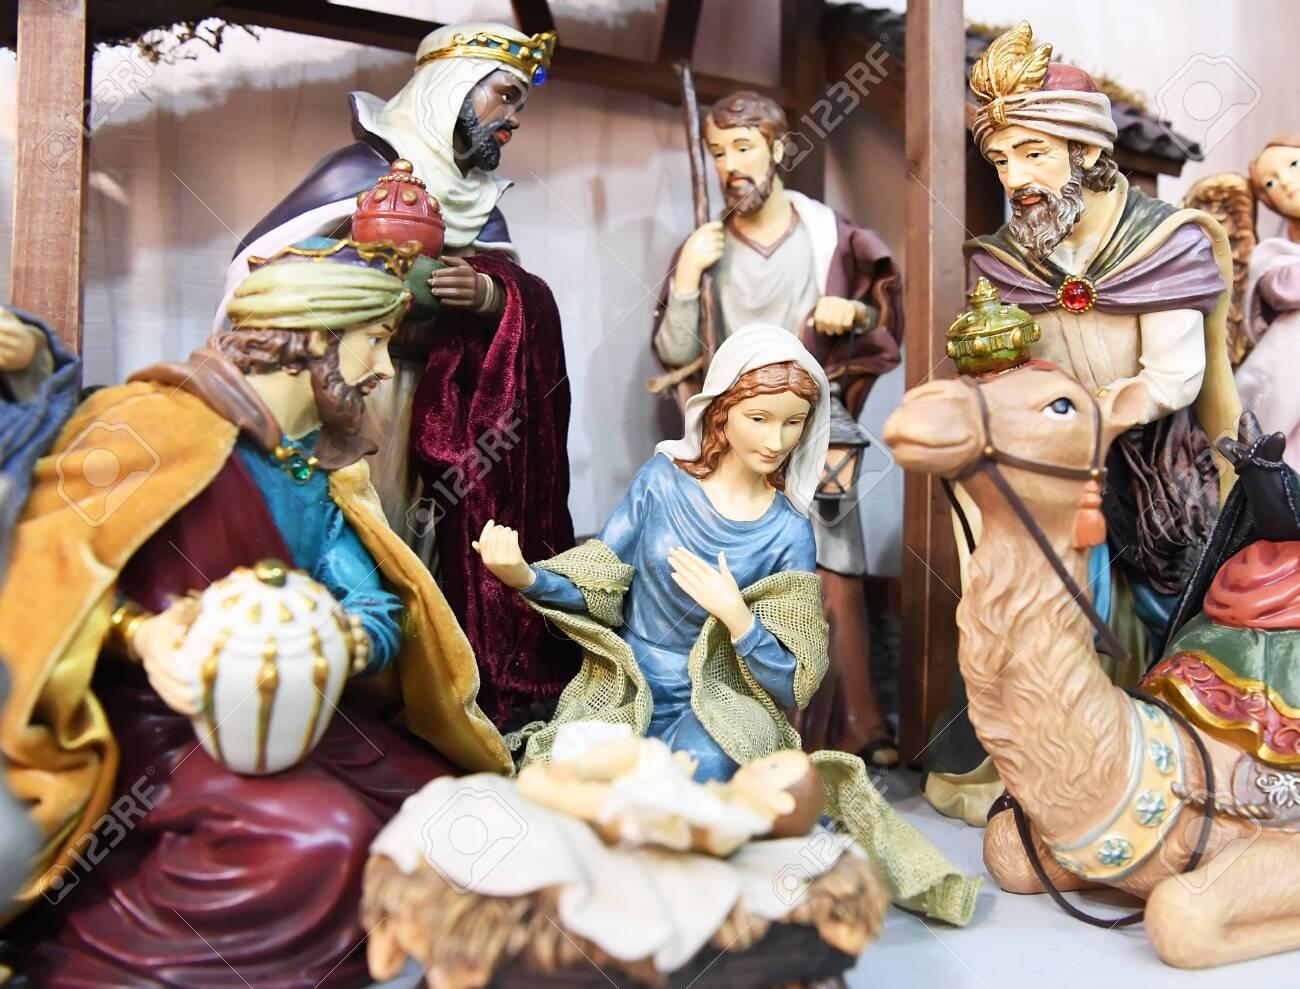 Nativity Scene Christmas Christmas Manger Scene With Figurines Newborn Jesus Mary Joseph And Magi Stock Photo Picture And Royalty Free Image Image 128943657